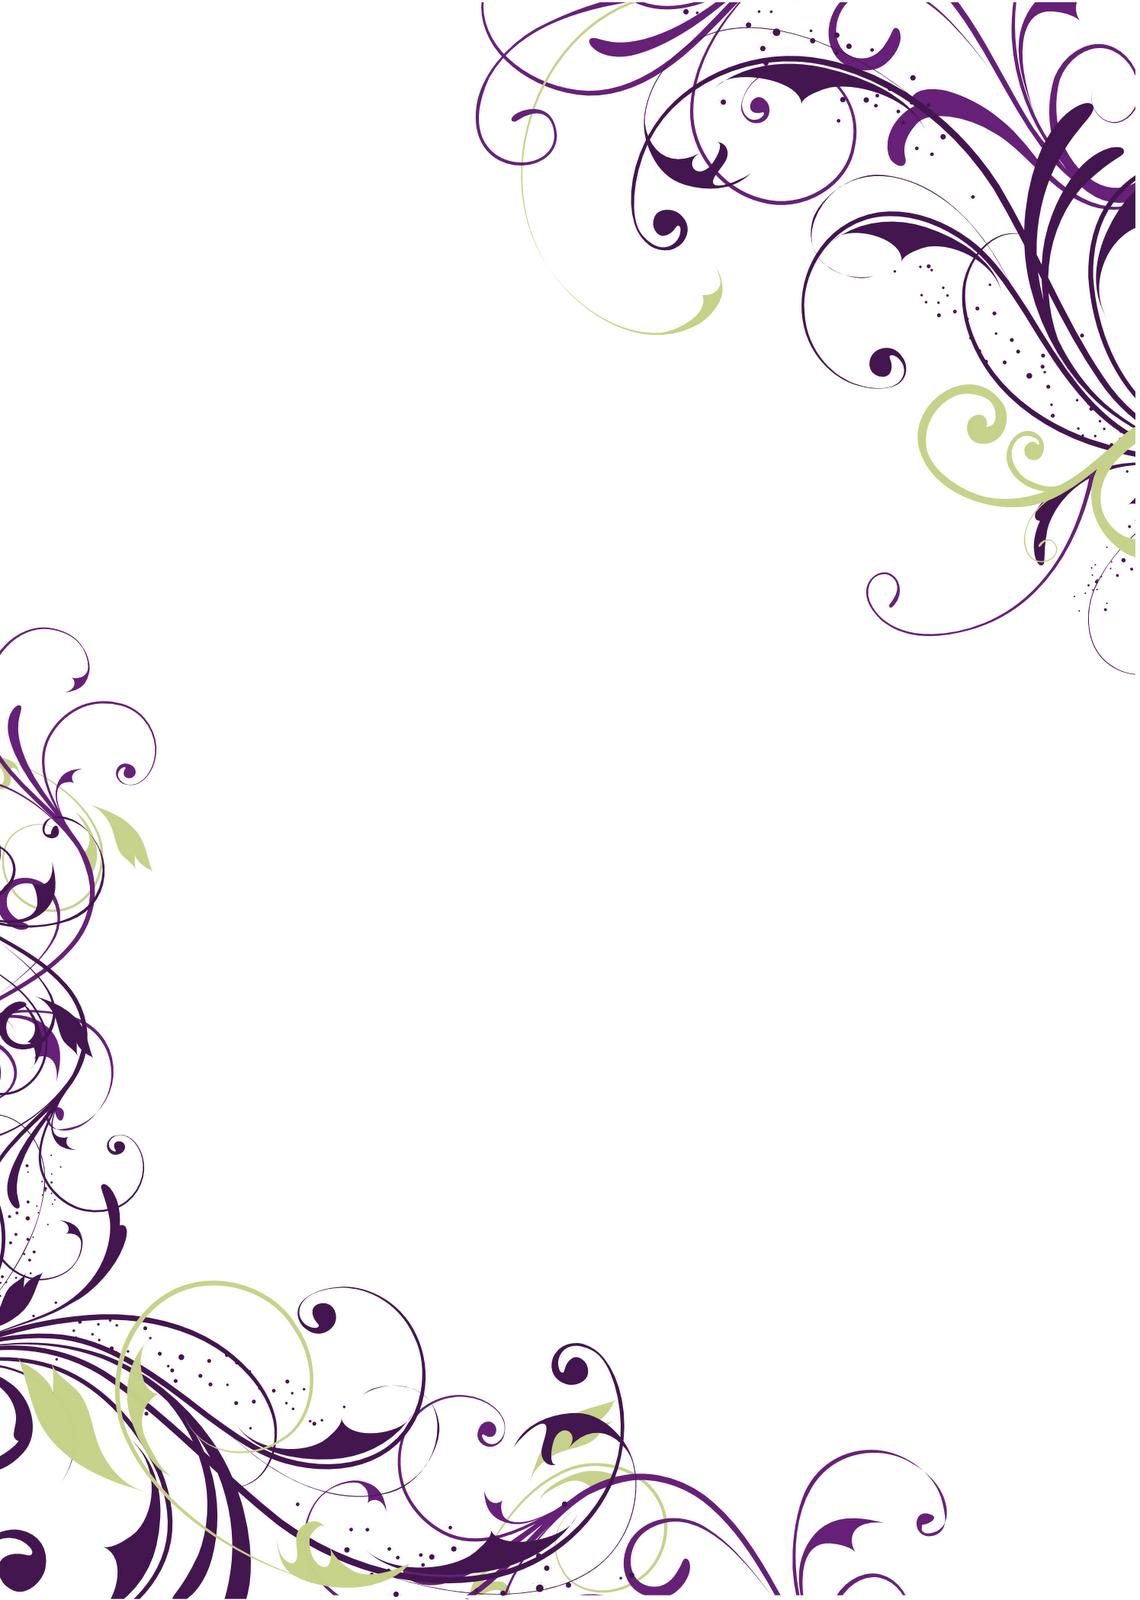 8 best images of free printable wedding invitation for Wedding invitation page borders free download